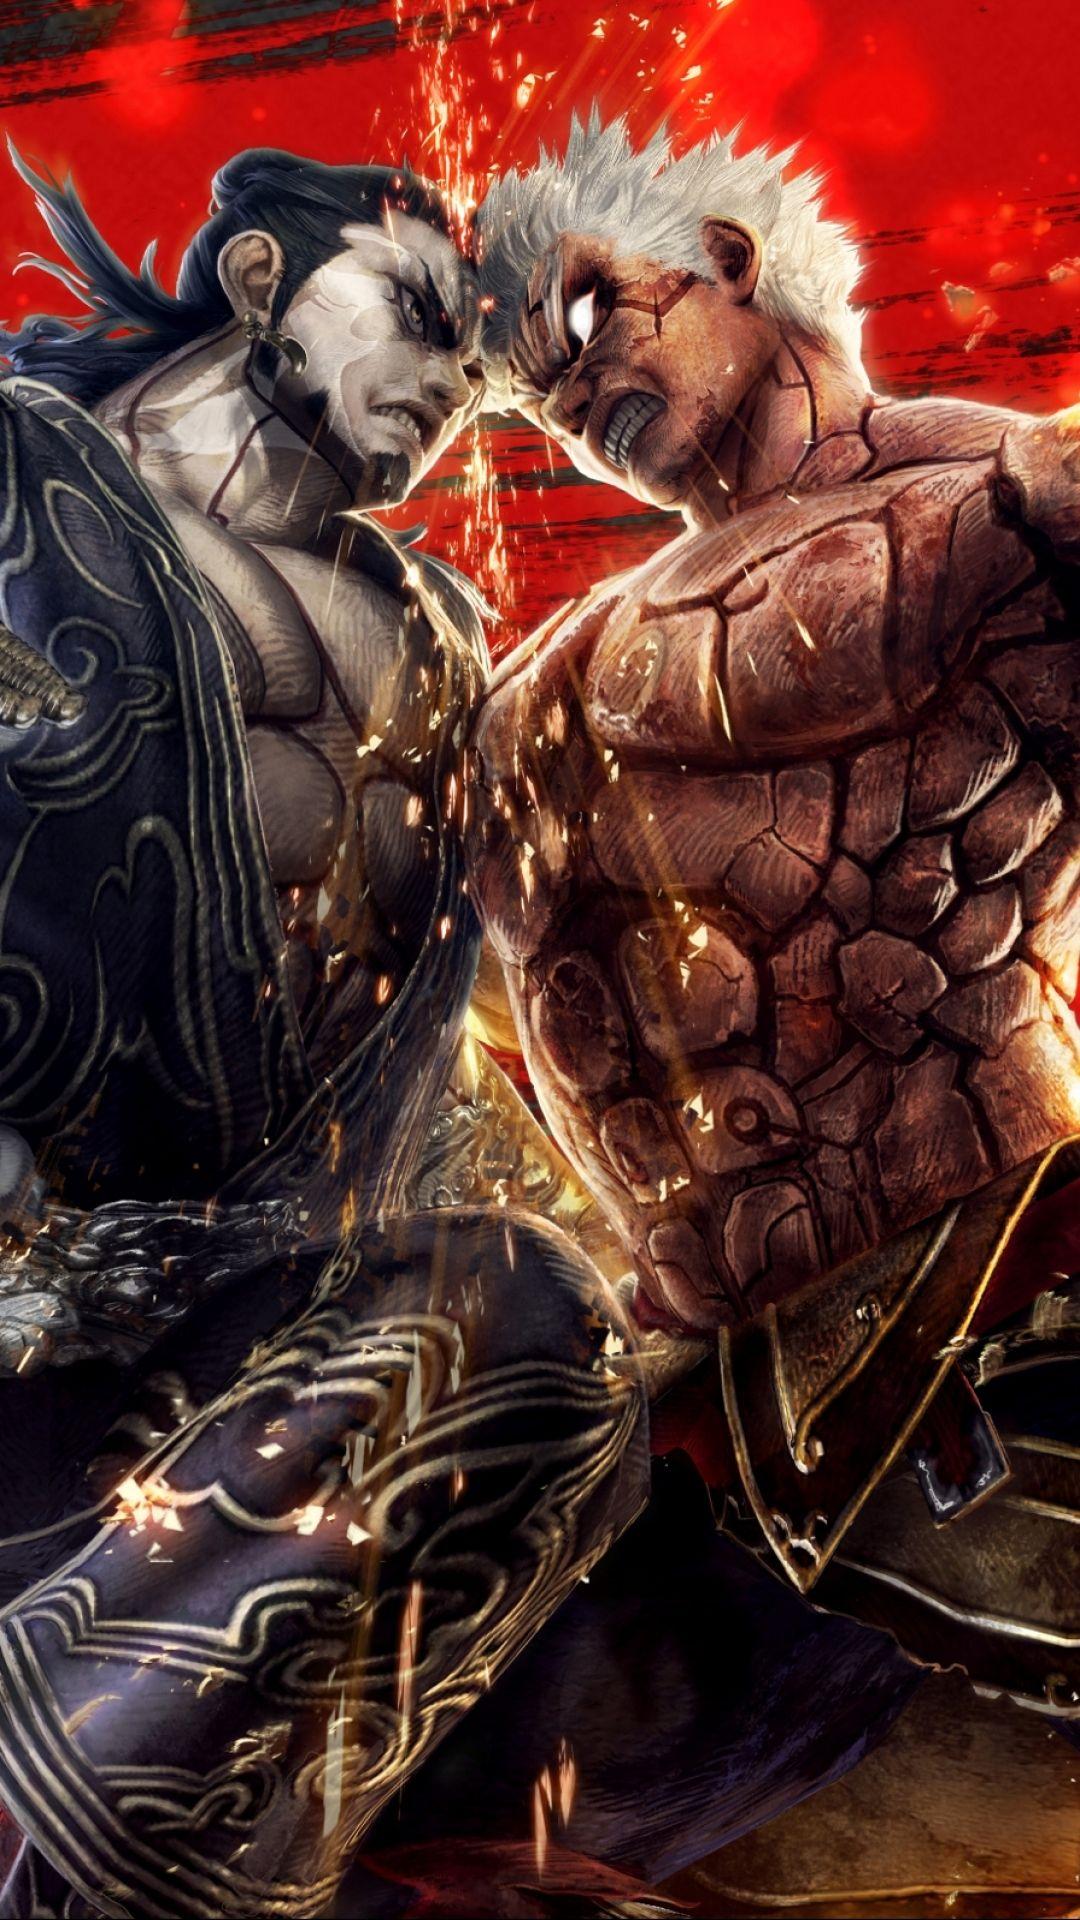 Asuras Wrath Hd Desktop Wallpaper High Definition Fullscreen Asura S Wrath Capcom Art Wrath